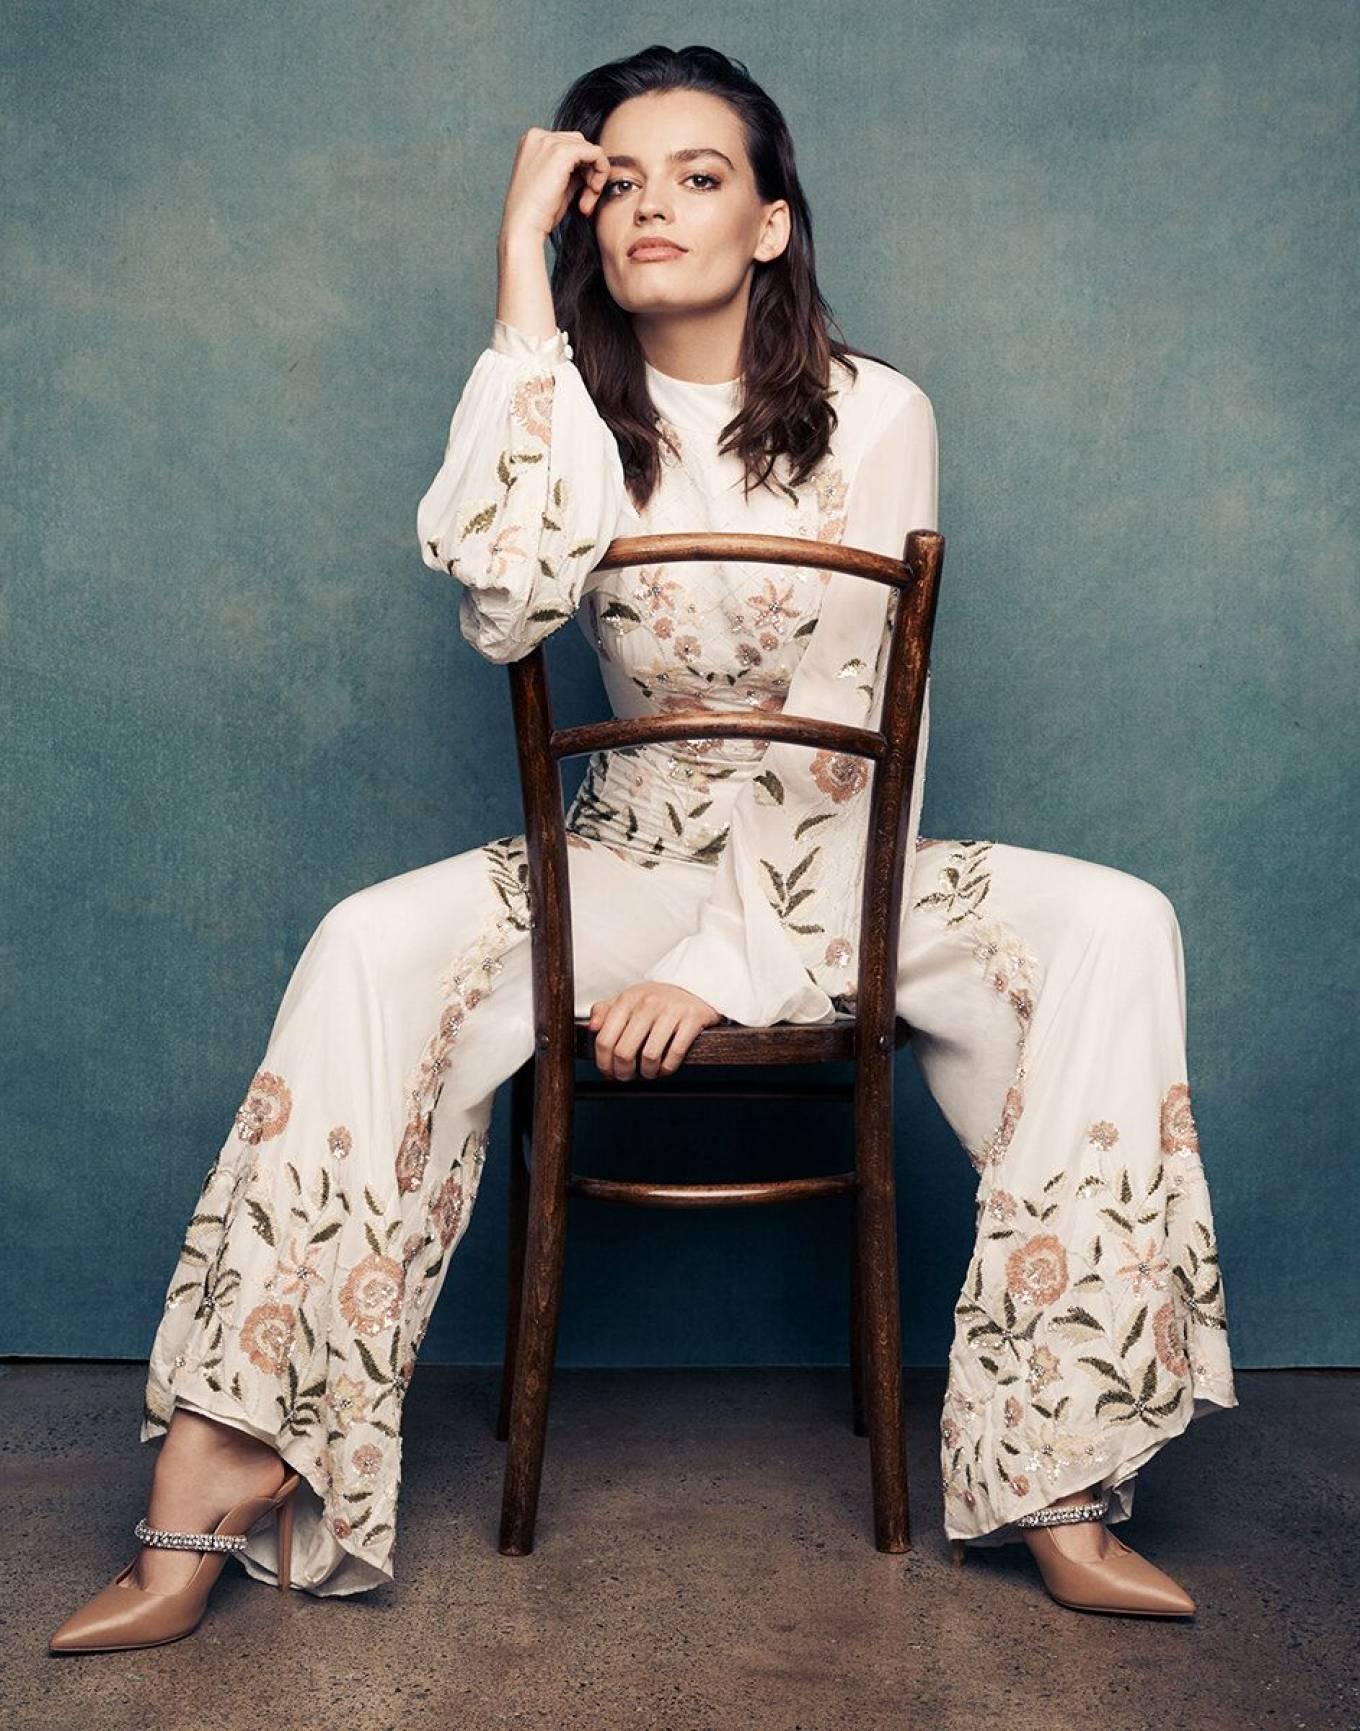 Emma Mackey 2020 : Emma Mackey – GQ Magazine (France 2020 issue)-05